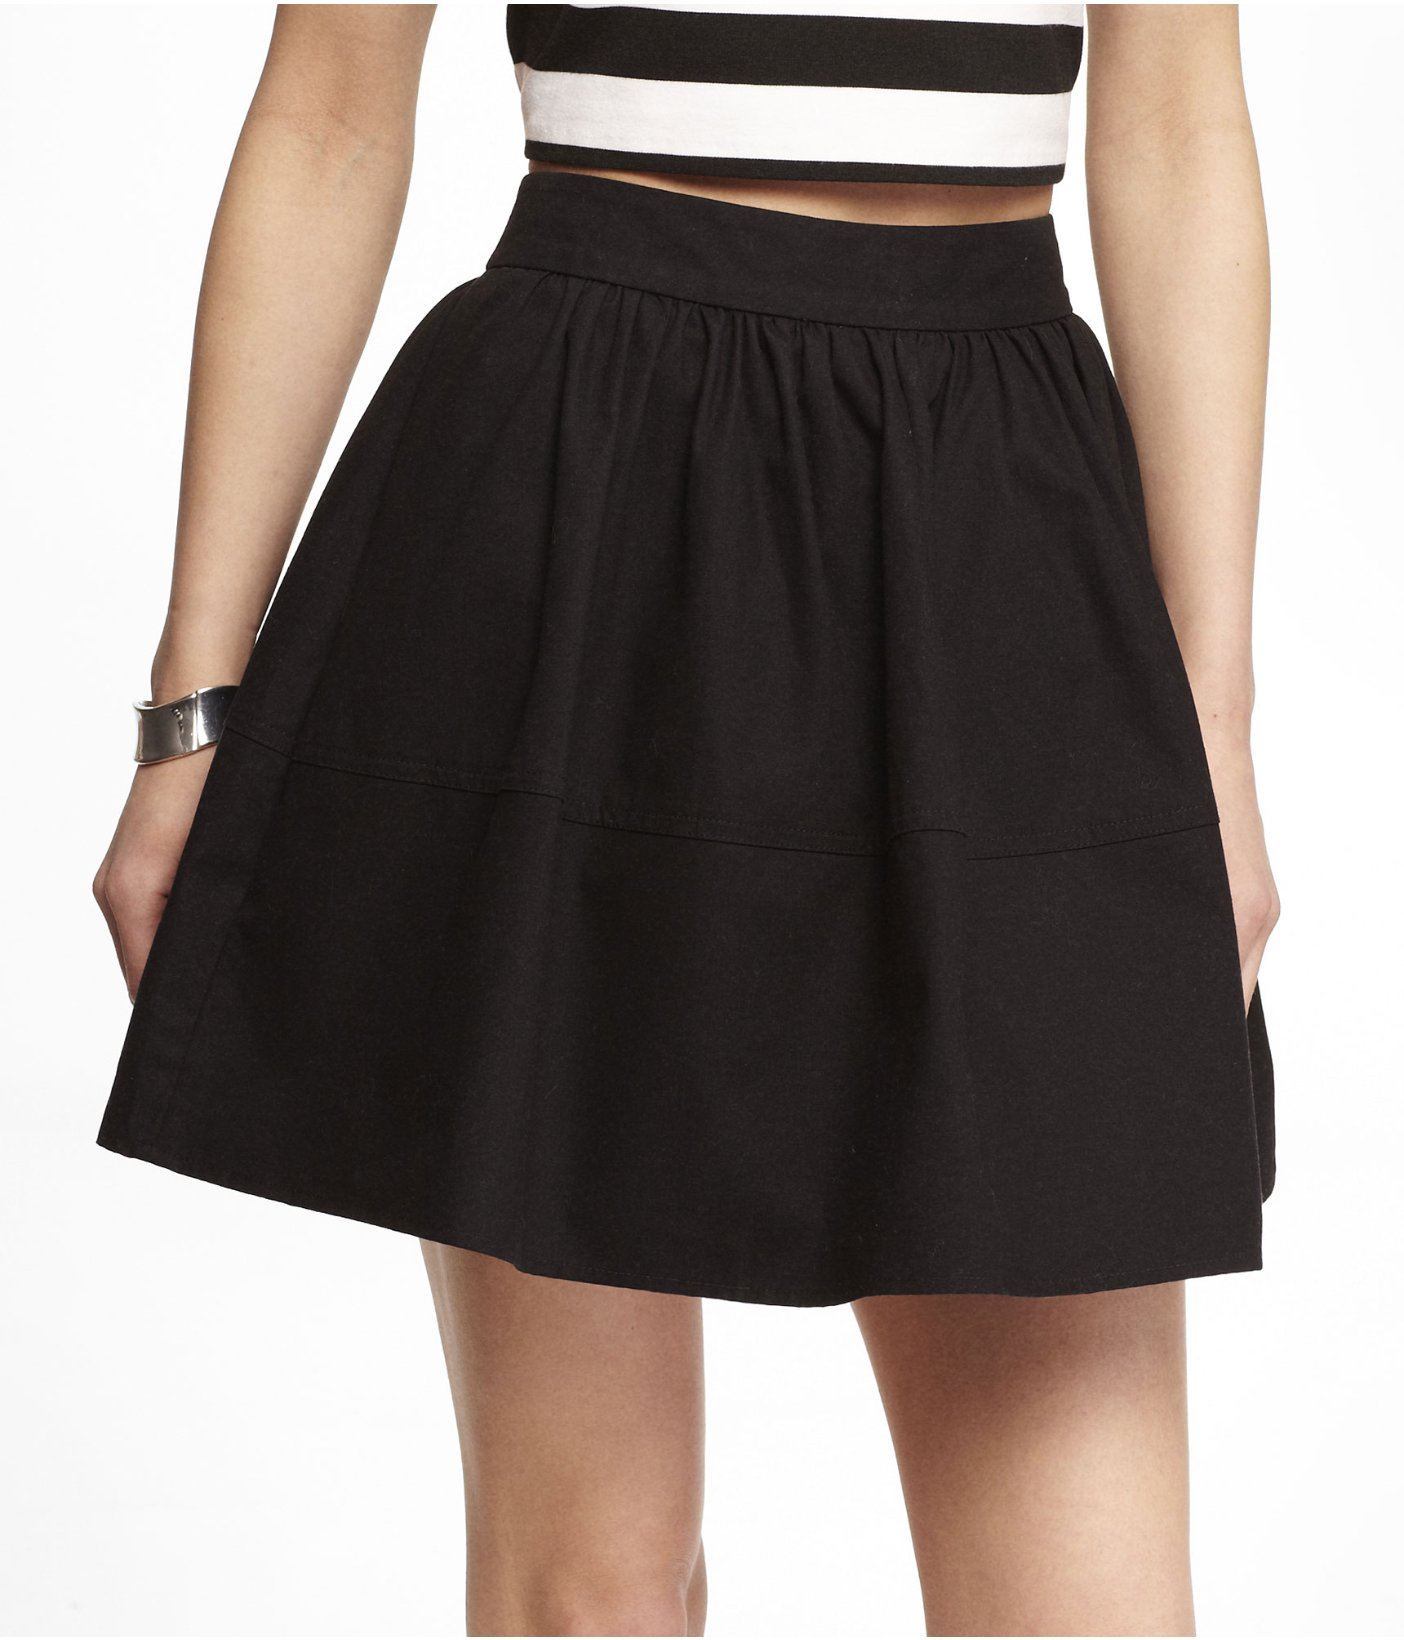 Lyst - Express High Waist Cotton Full Skirt in Black